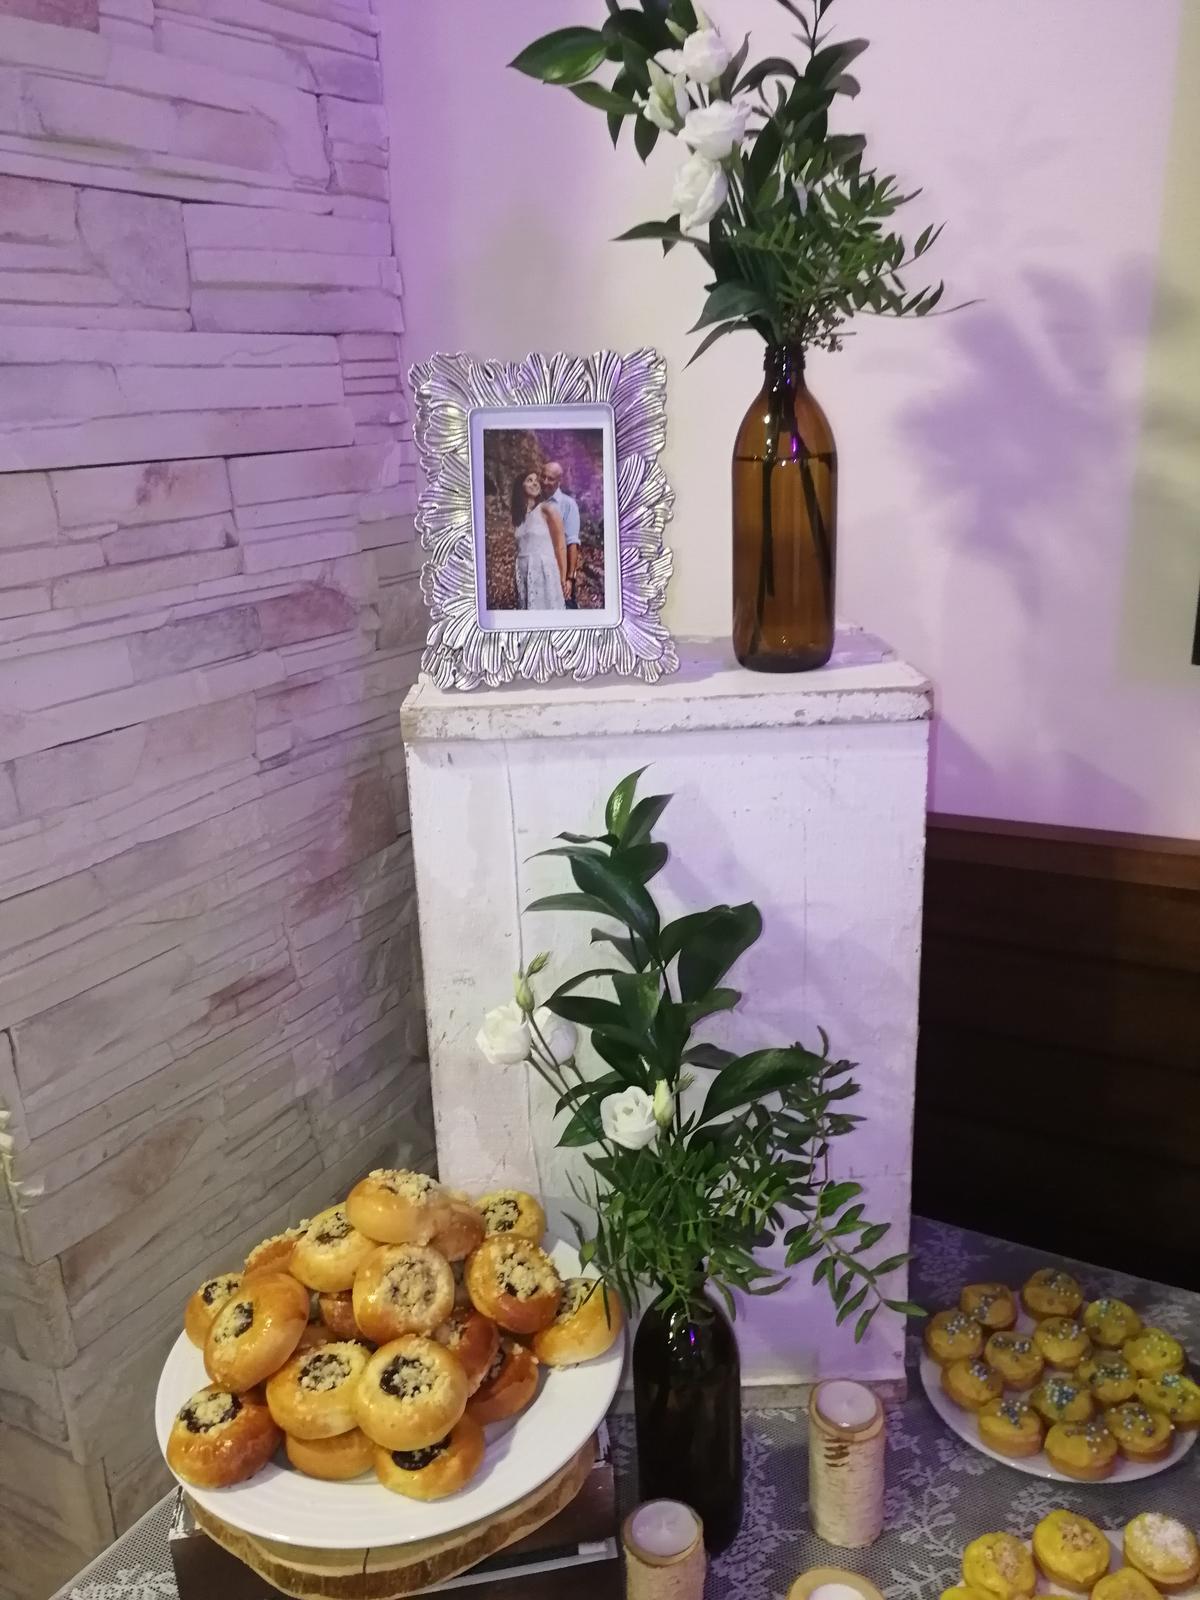 Svadba 29.9.2018 Hotel Kontakt - Obrázok č. 34